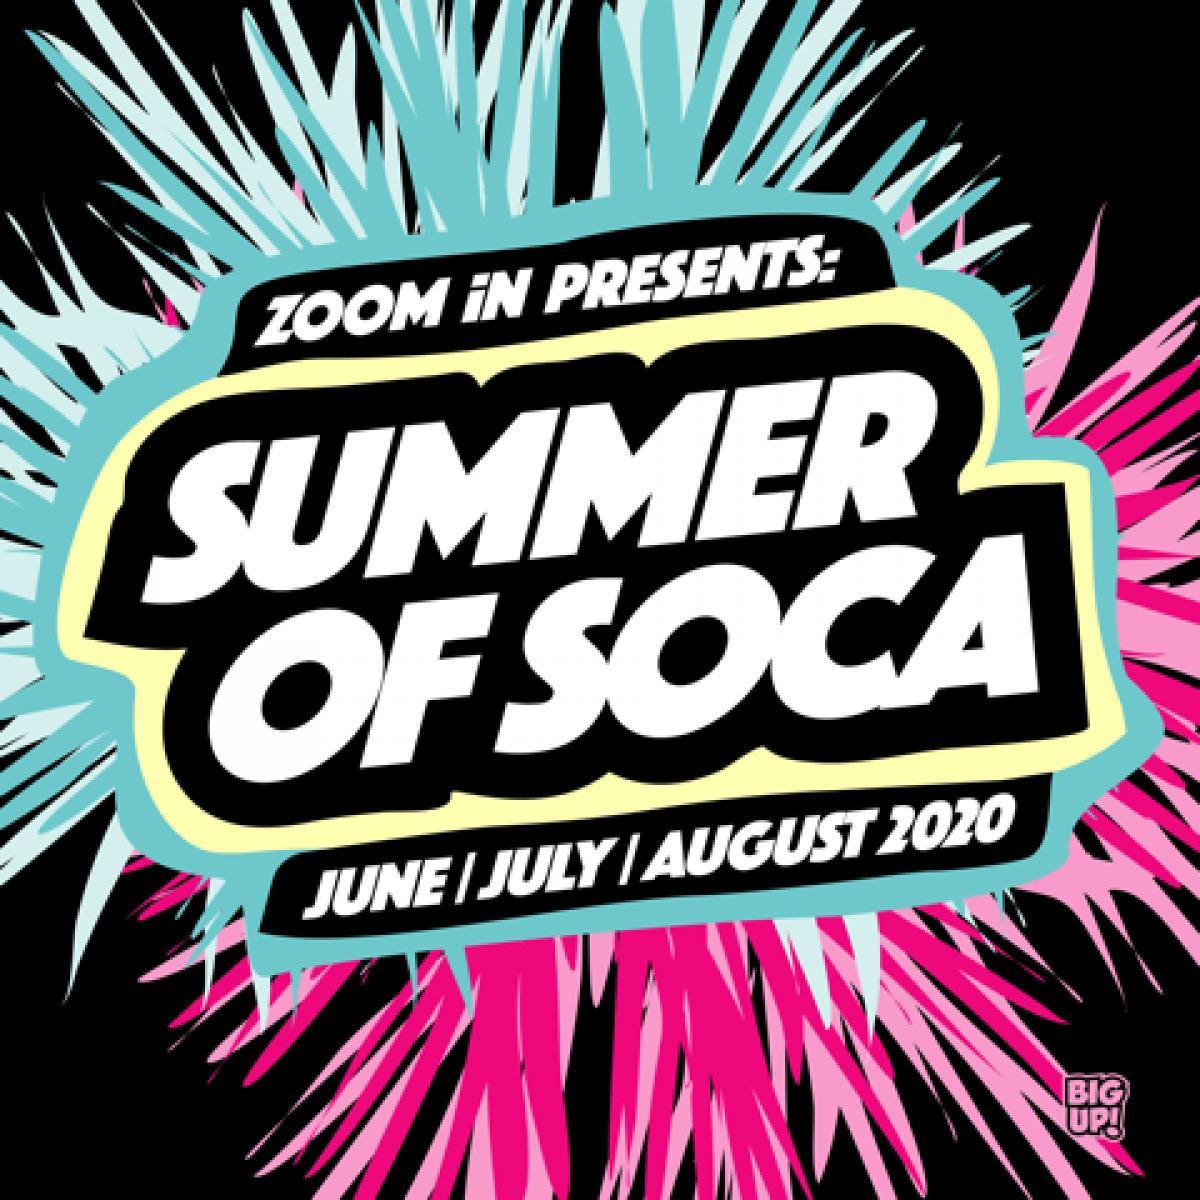 Summer Of Soca - Big Fat Ending SOS Fete Edition flyer or graphic.